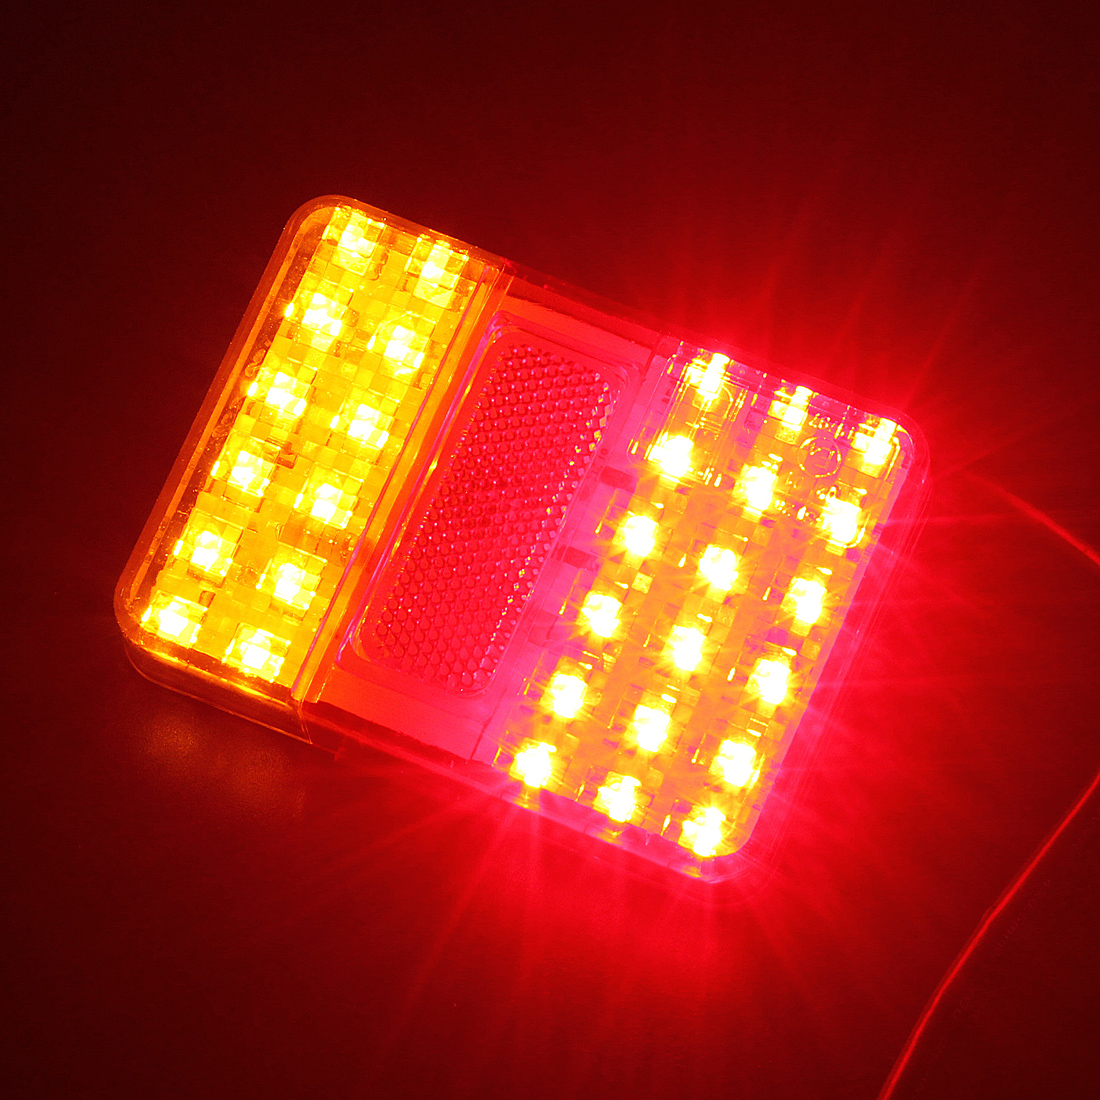 2x 12v 30 led feu arri re lampe tail bande t moin signal e marke camion remorque ebay. Black Bedroom Furniture Sets. Home Design Ideas